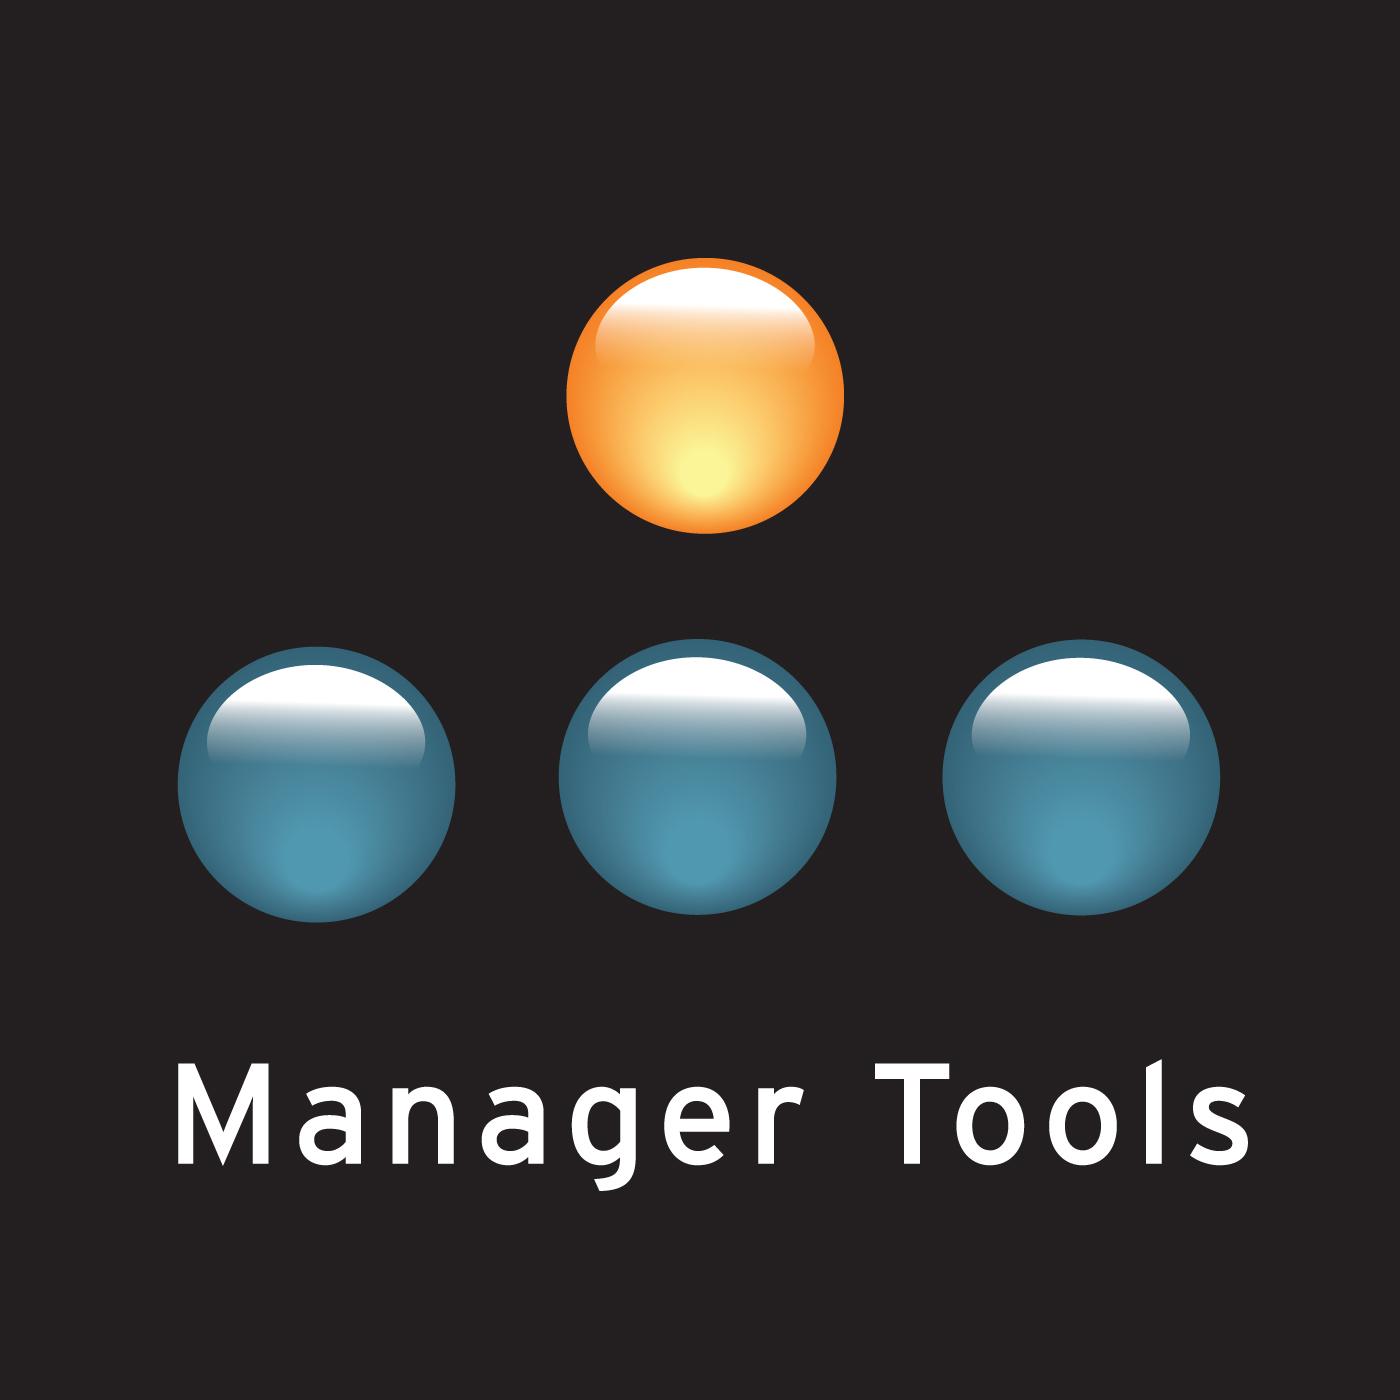 ManagerTools_Logo_1400x1400